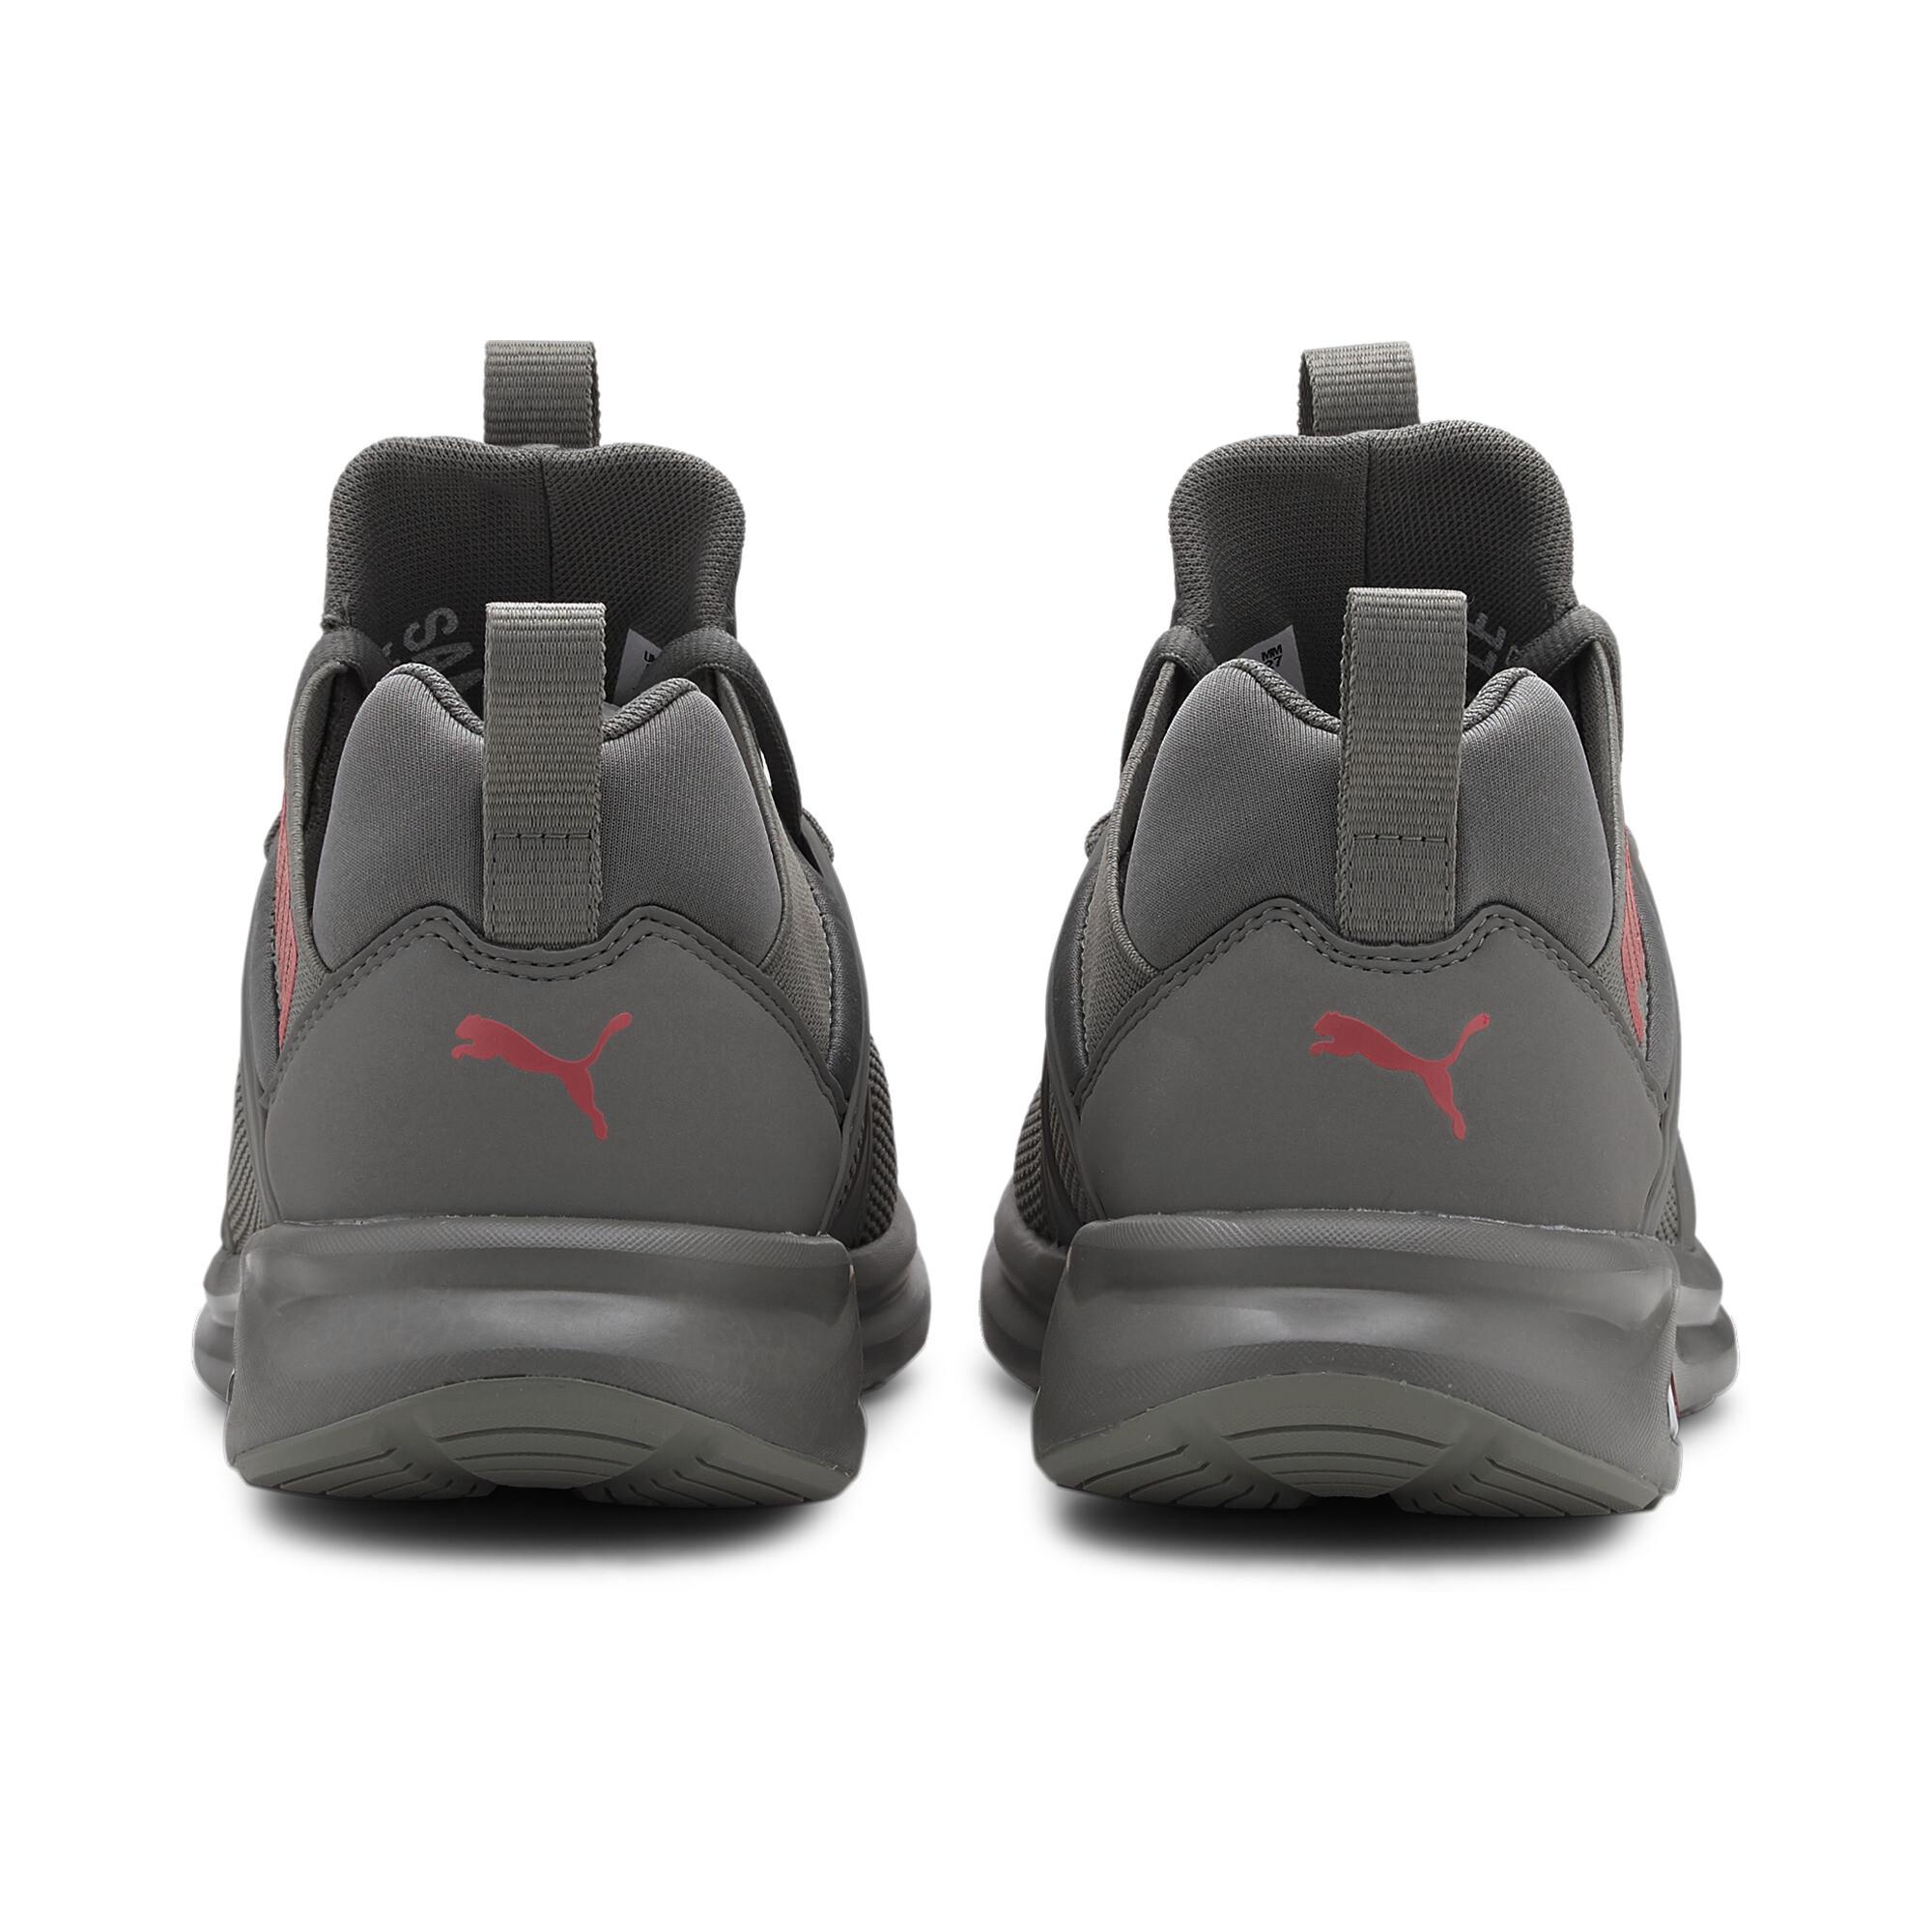 PUMA-Men-039-s-Enzo-2-Training-Shoes thumbnail 29